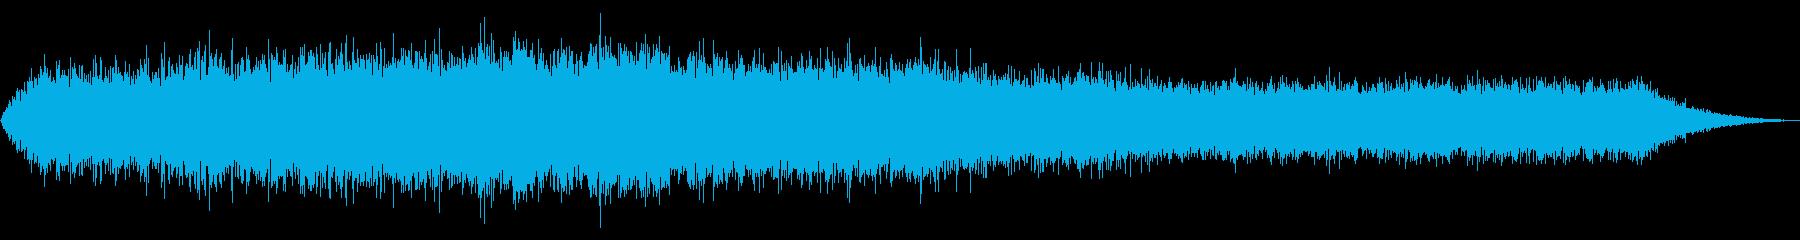 THY低アンビエントトーンと重いピ...の再生済みの波形